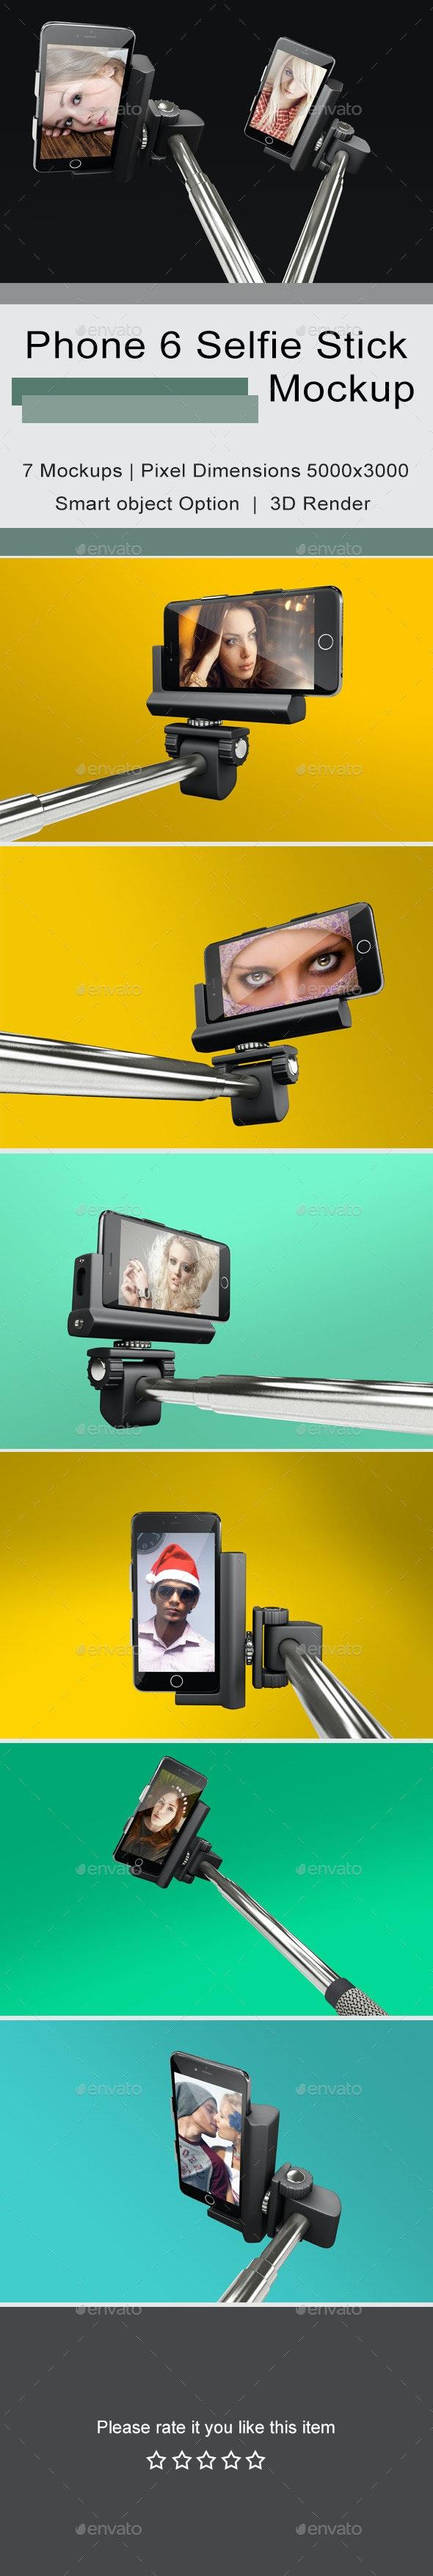 Phone 6 Selfie Stick Mockup 2 - Mobile Displays